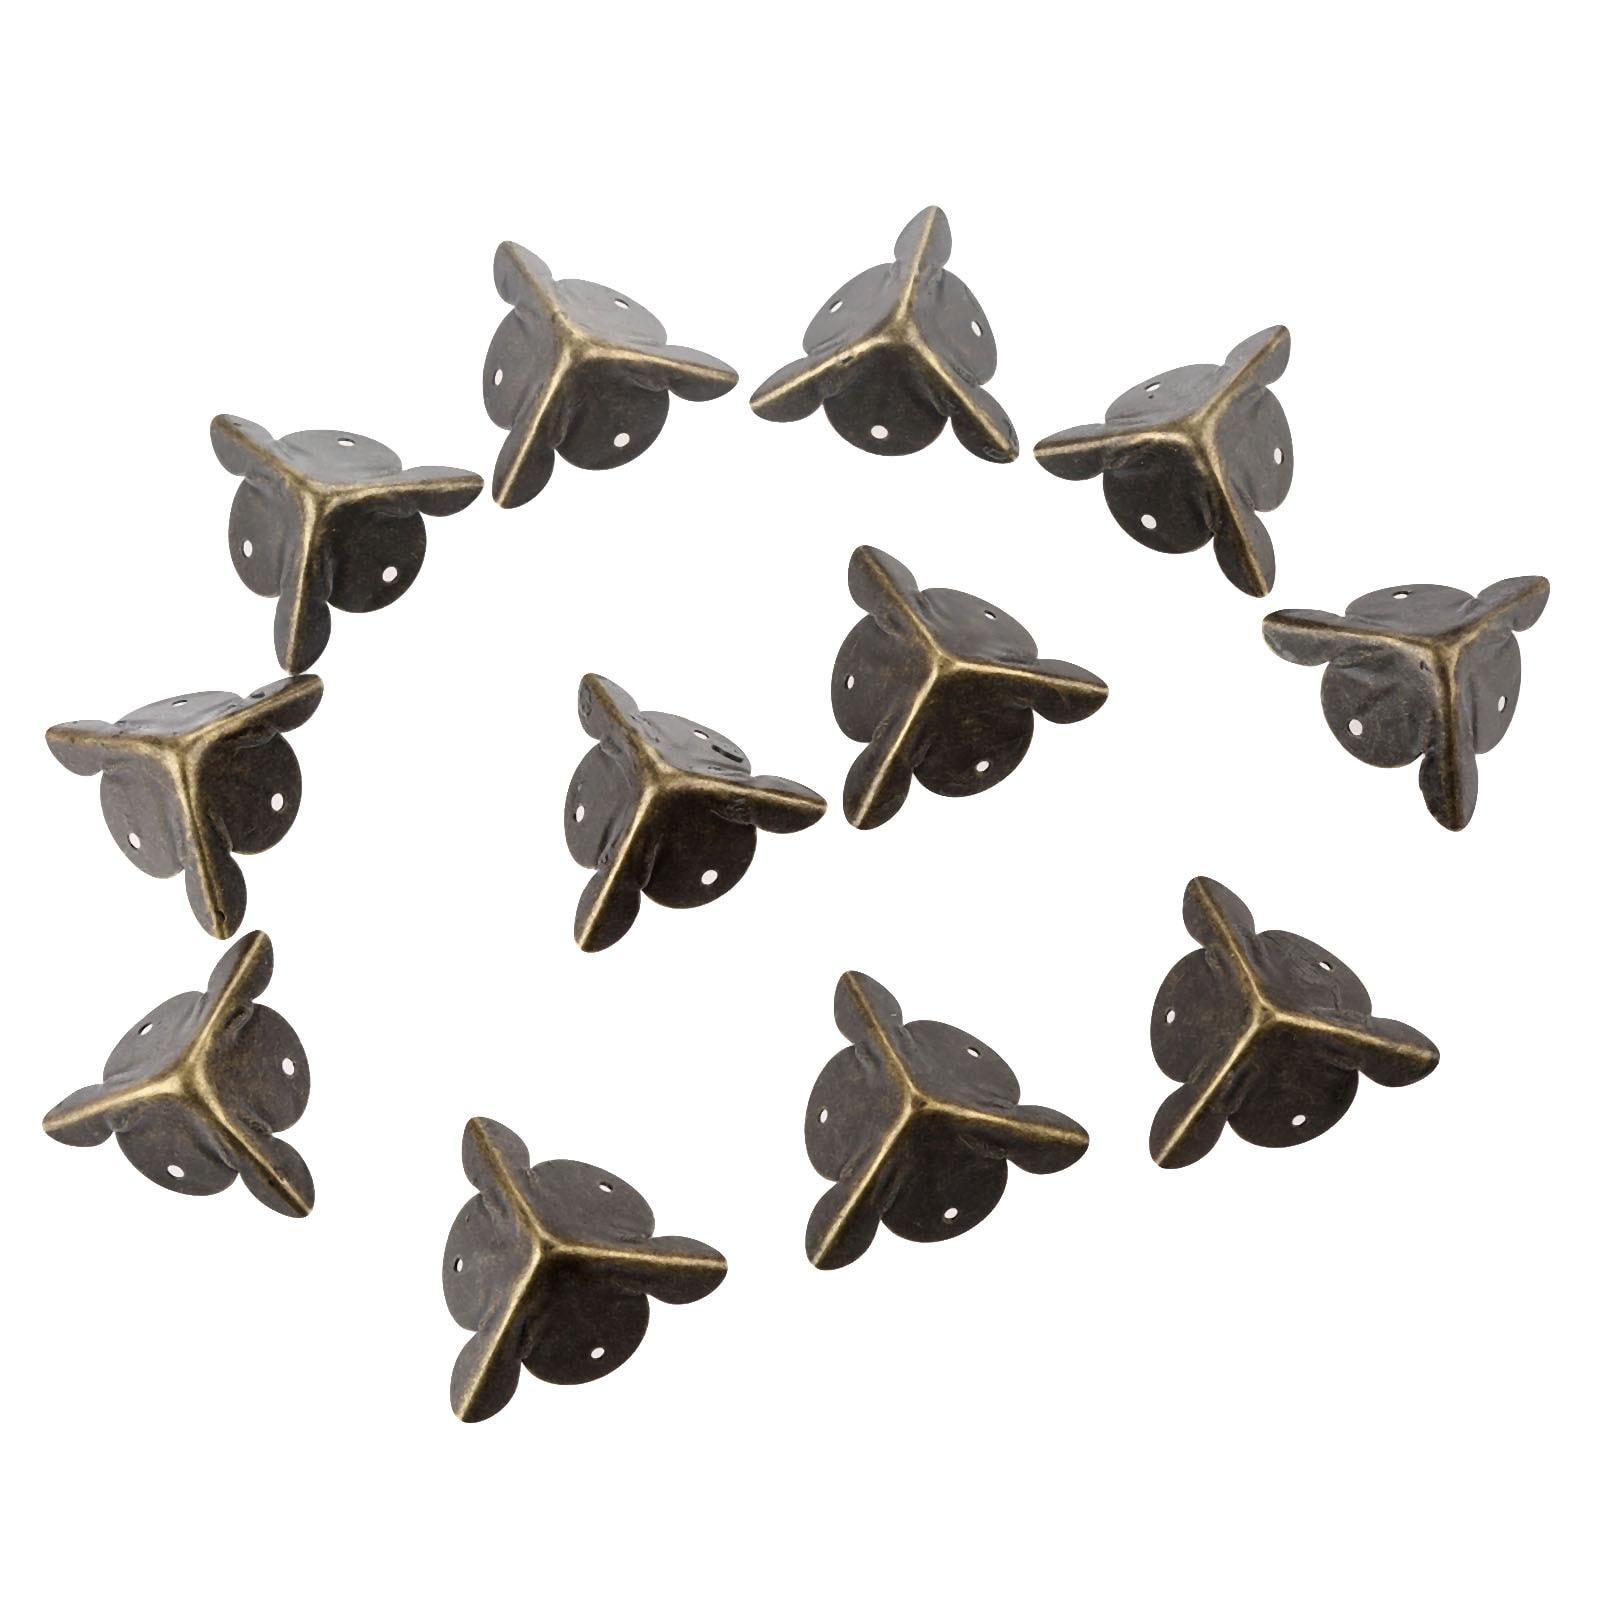 12pcs-antique-corner-bracket-jewelry-gift-box-wood-case-decorative-feet-leg-corner-decorative-protector-furniture-fittings-nails